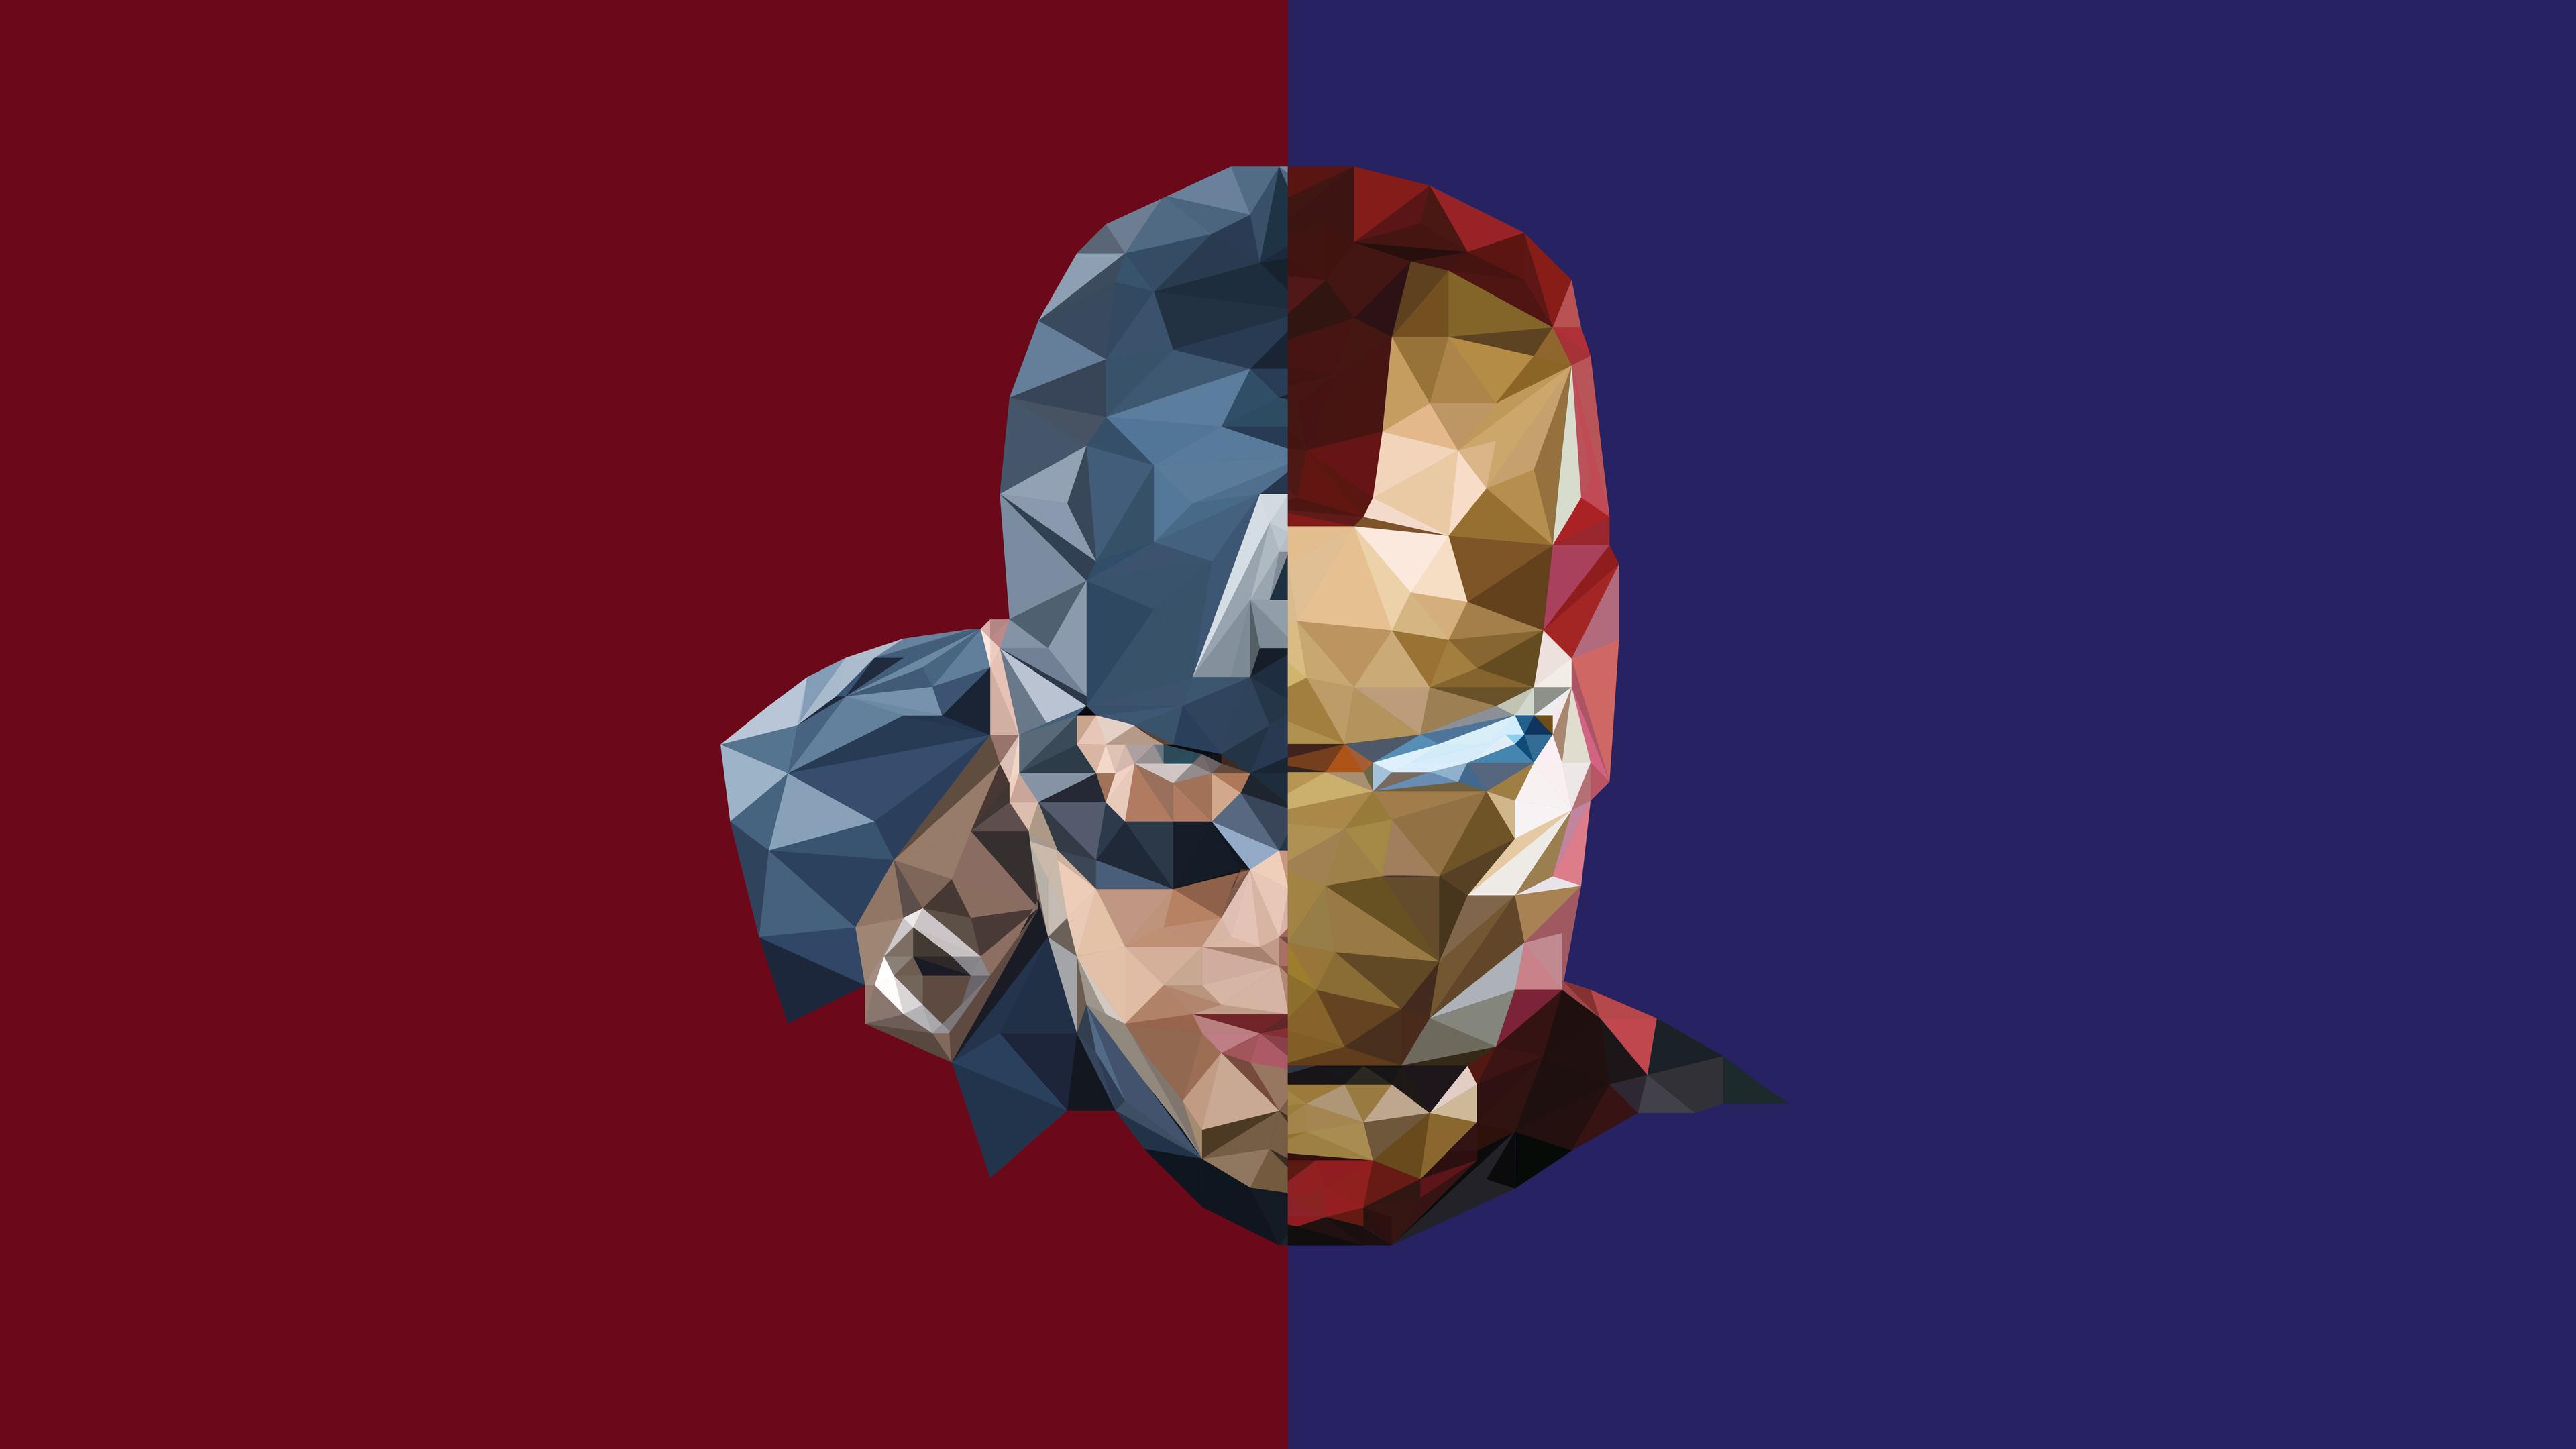 iron man captain america abstract 1536522567 - Iron Man Captain America Abstract - iron man wallpapers, hd-wallpapers, captain america wallpapers, artwork wallpapers, artist wallpapers, abstract wallpapers, 8k wallpapers, 5k wallpapers, 4k-wallpapers